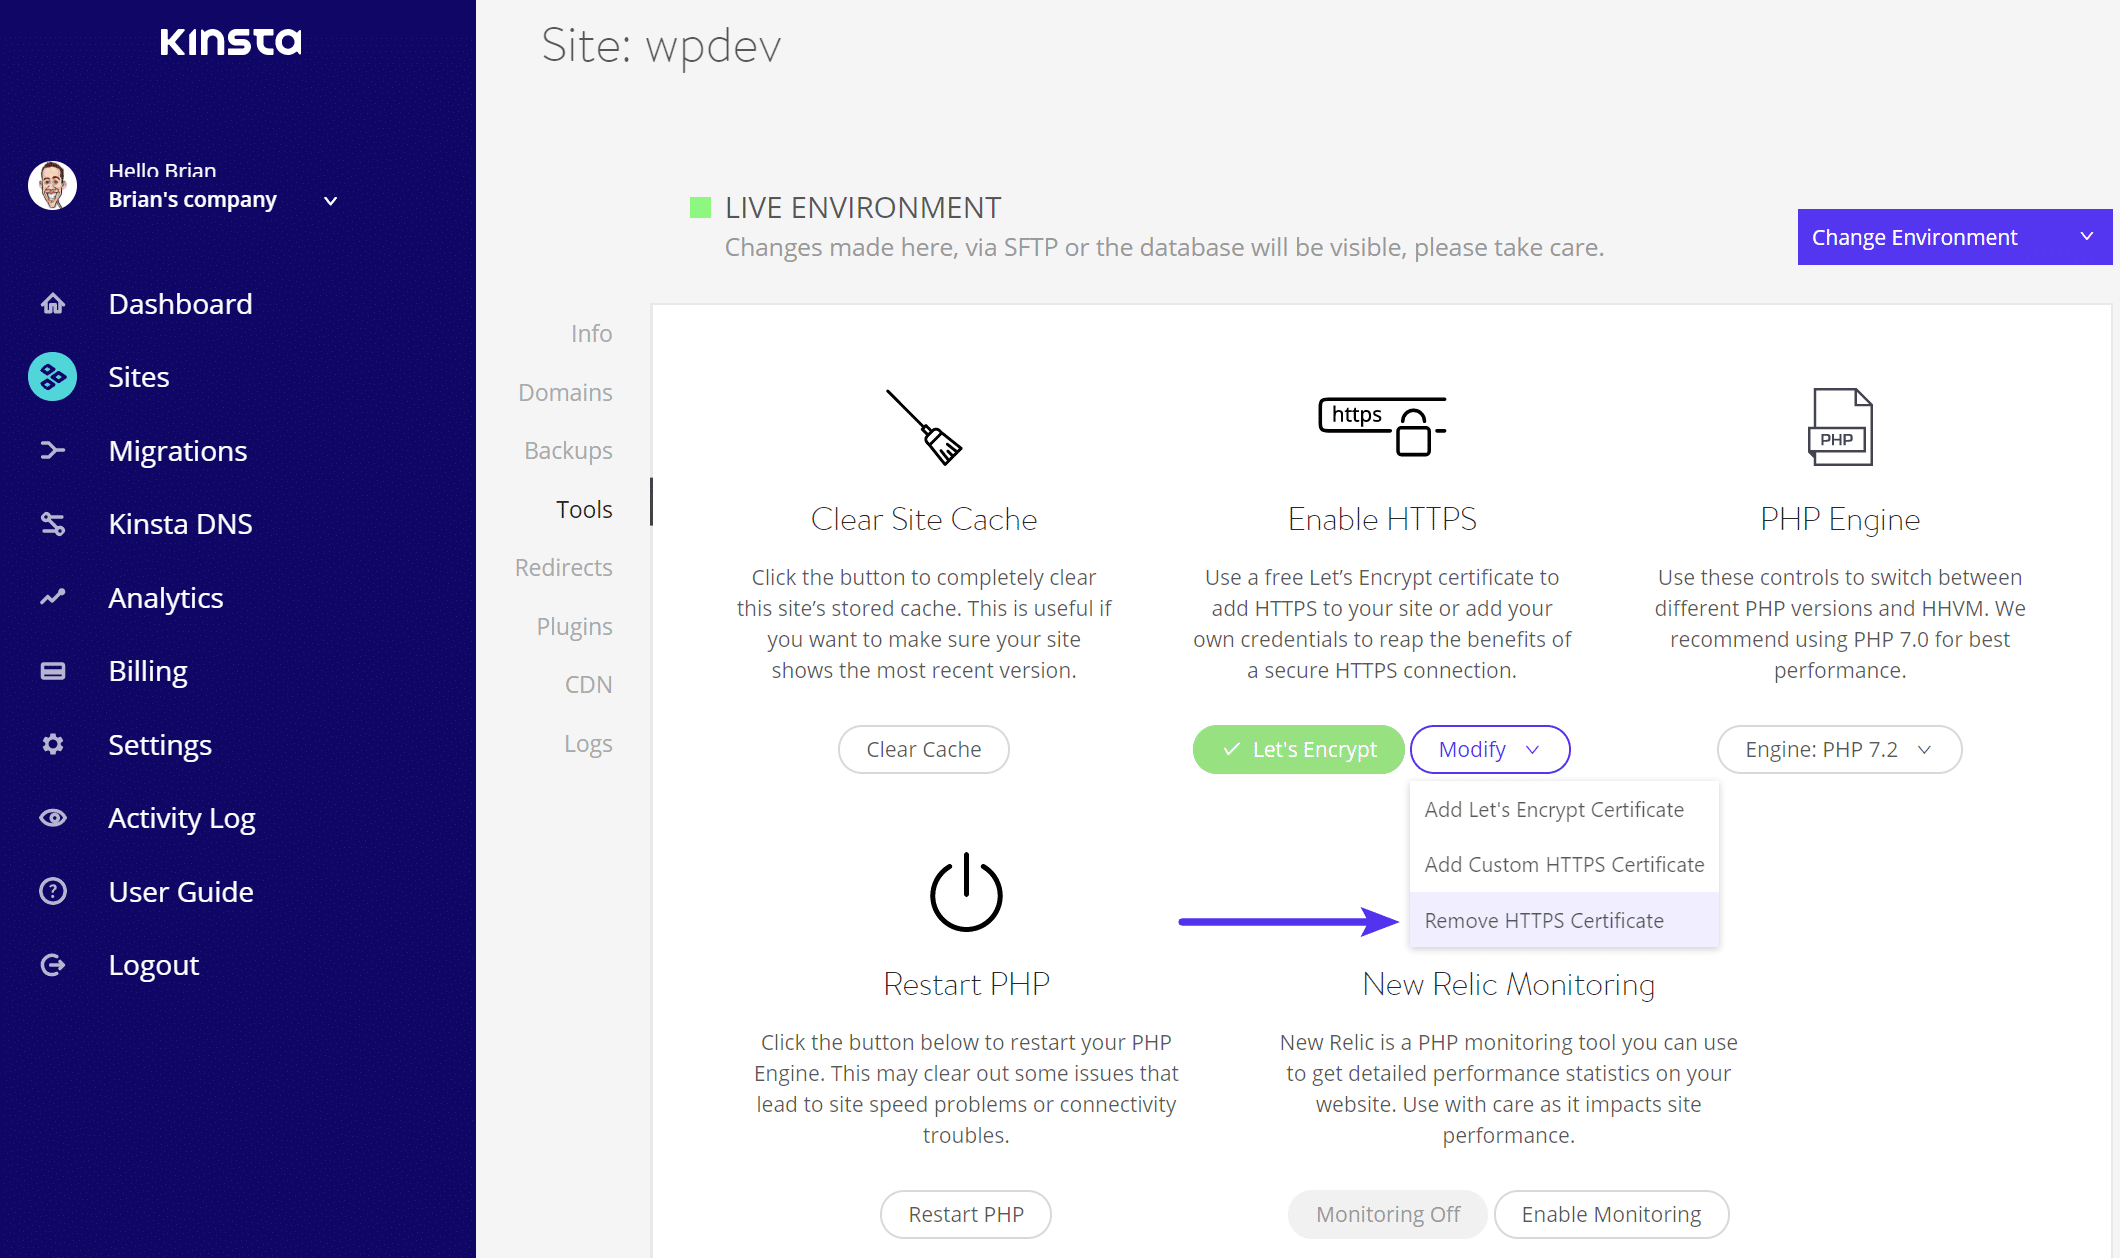 Fjern HTTPS certifikat